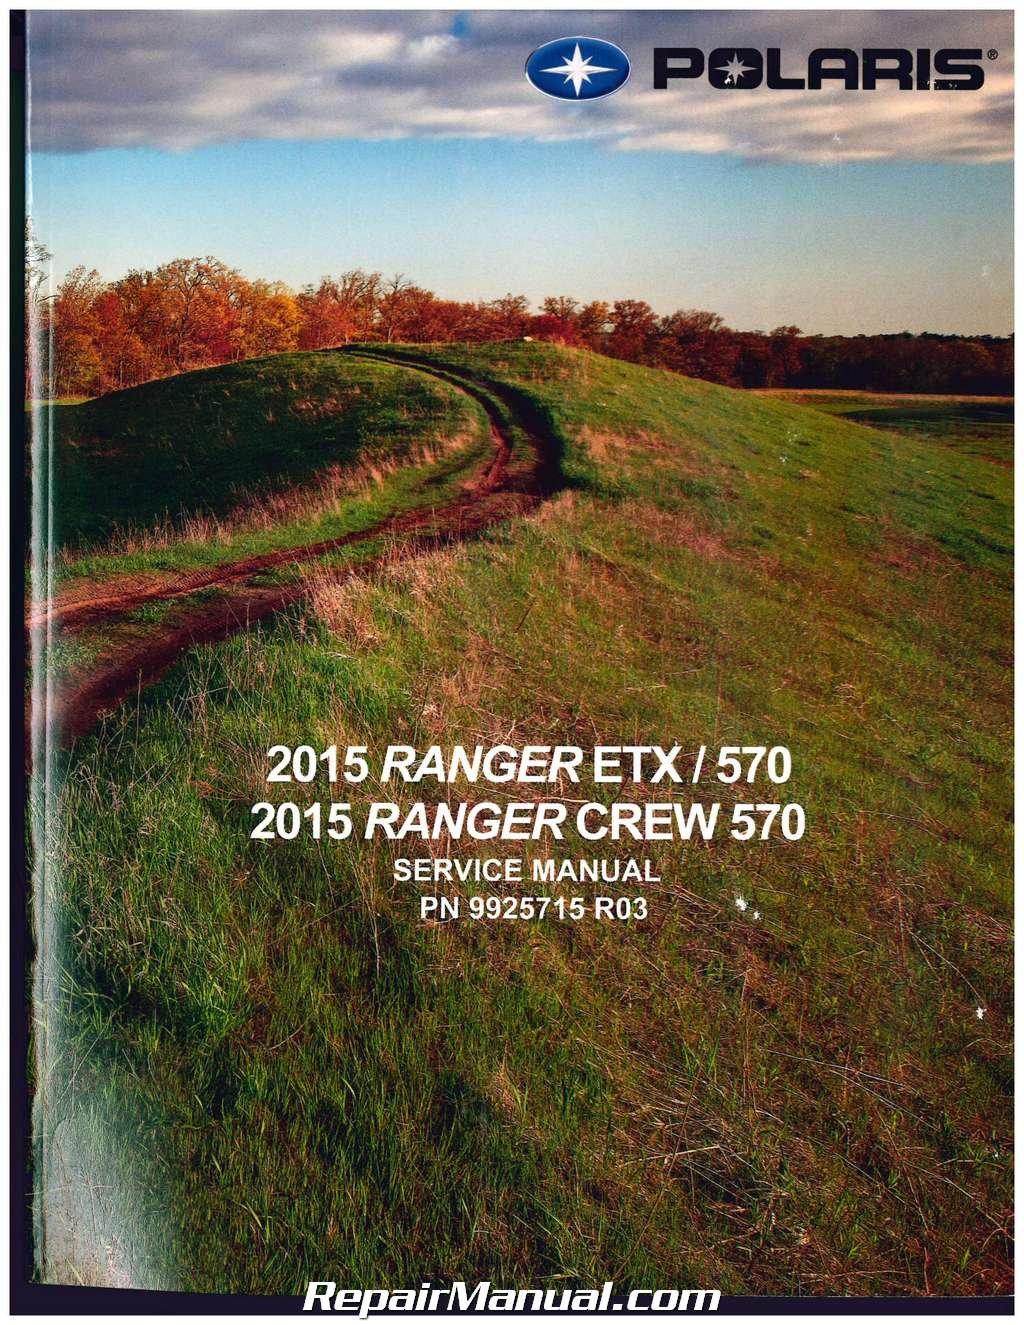 9925715 2015 Polaris Ranger 570 ETX CREW Side by Side Service Manual:  Manufacturer: Amazon.com: Books